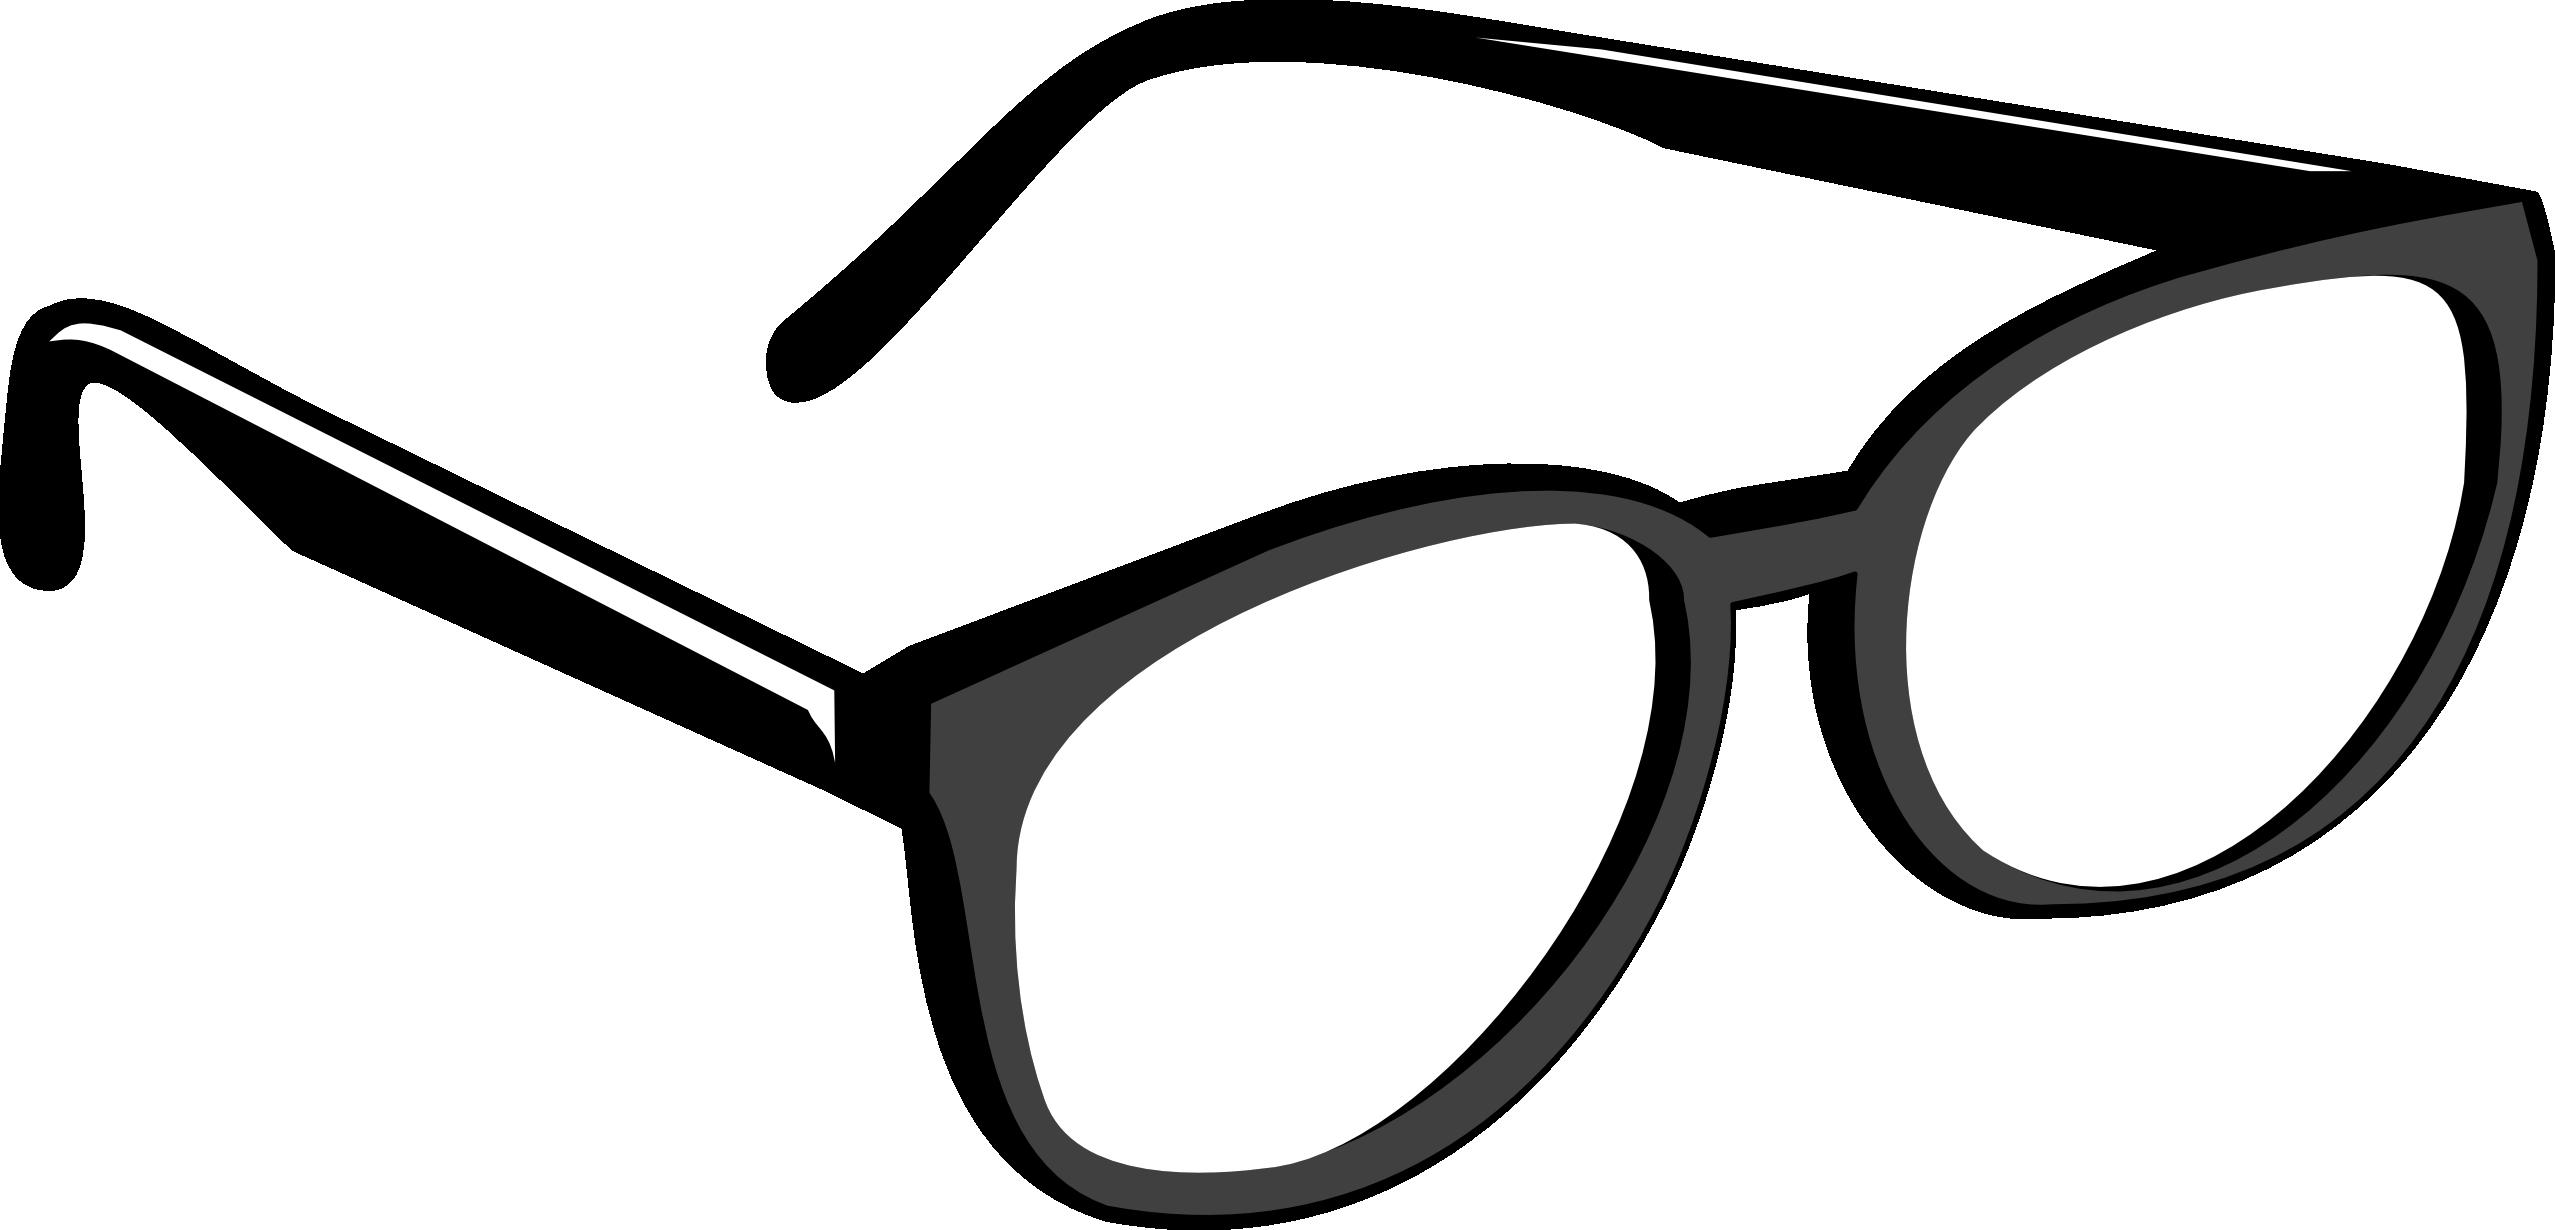 2555x1230 Eyeglasses Clip Art Free Clipart Images